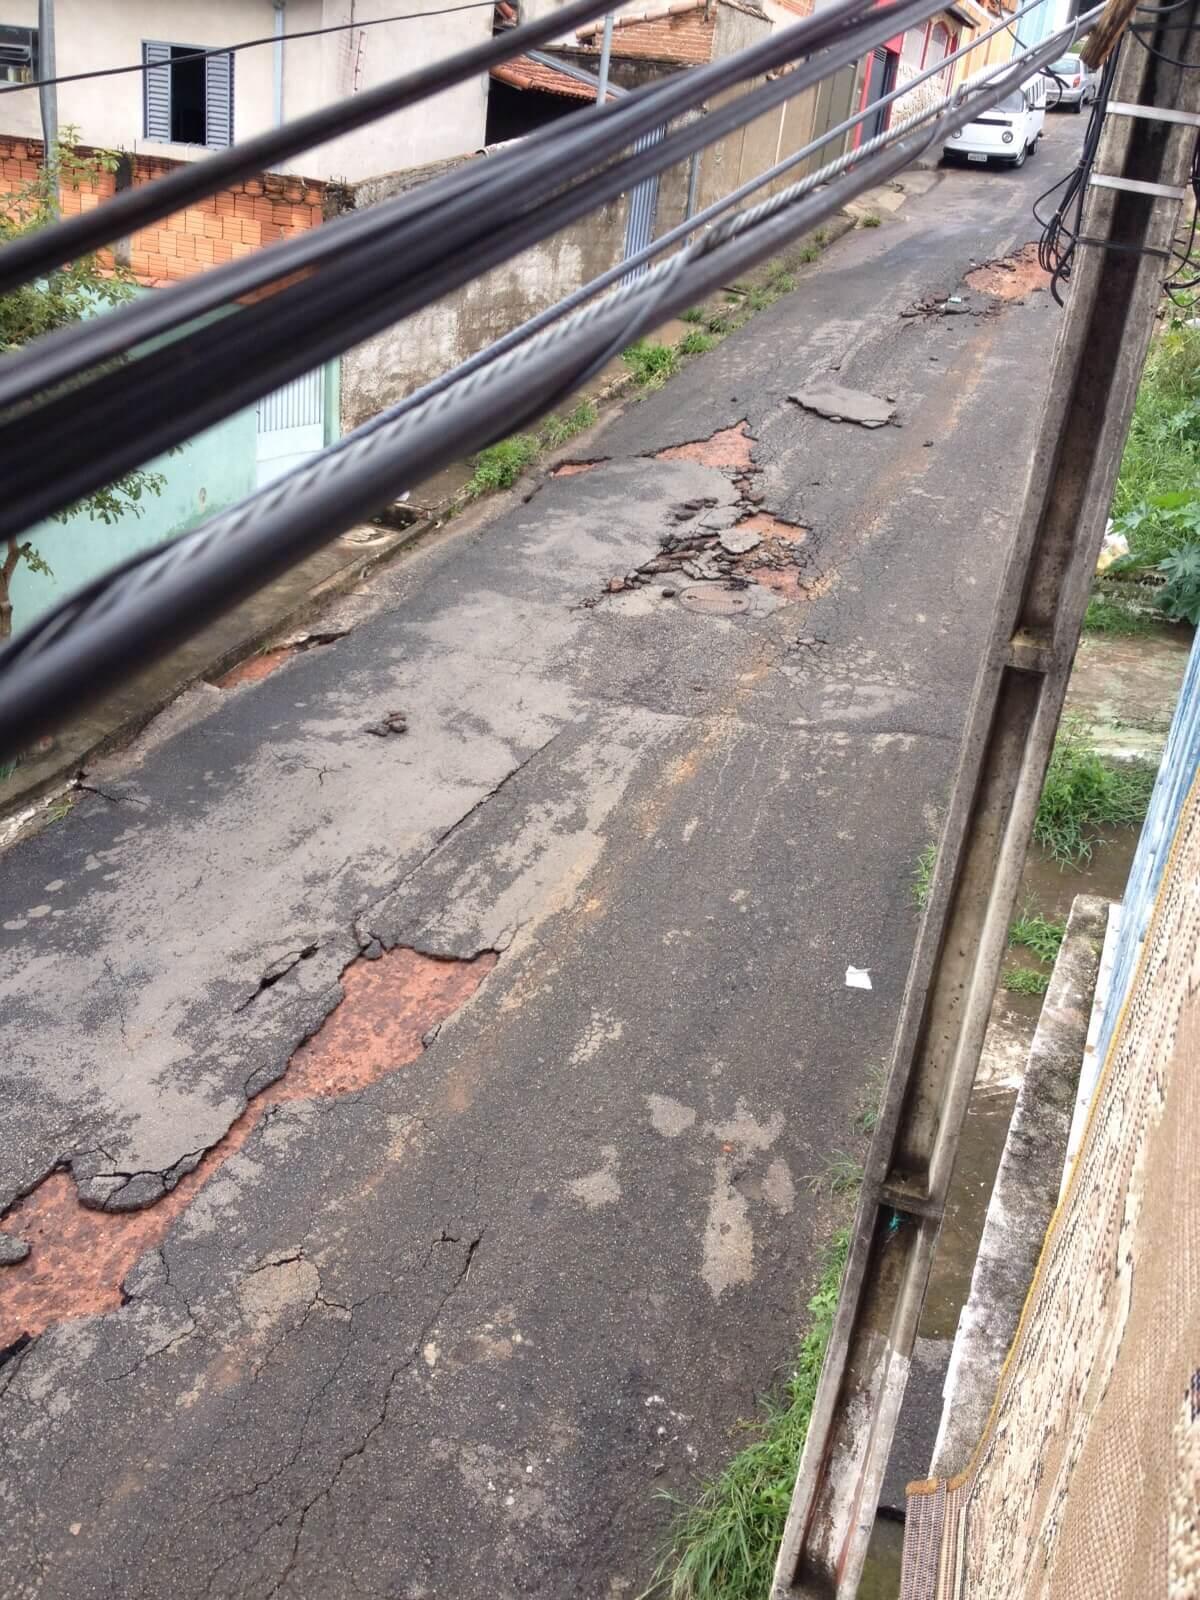 Chuva deixou estragos na Rua B, no bairro Bela Vista. Foto: Emanoel Melo